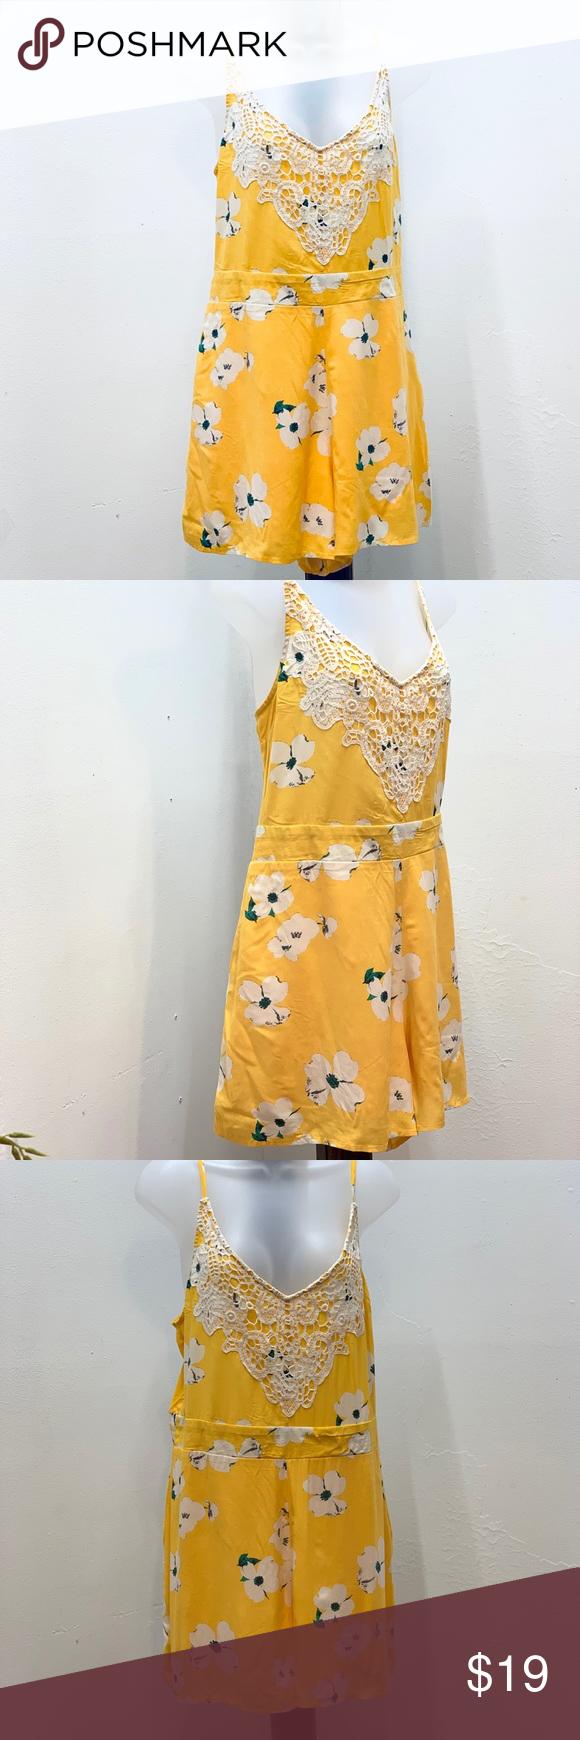 Romper Summer Dress Summer Dresses Dresses Summer Romper [ 1740 x 580 Pixel ]